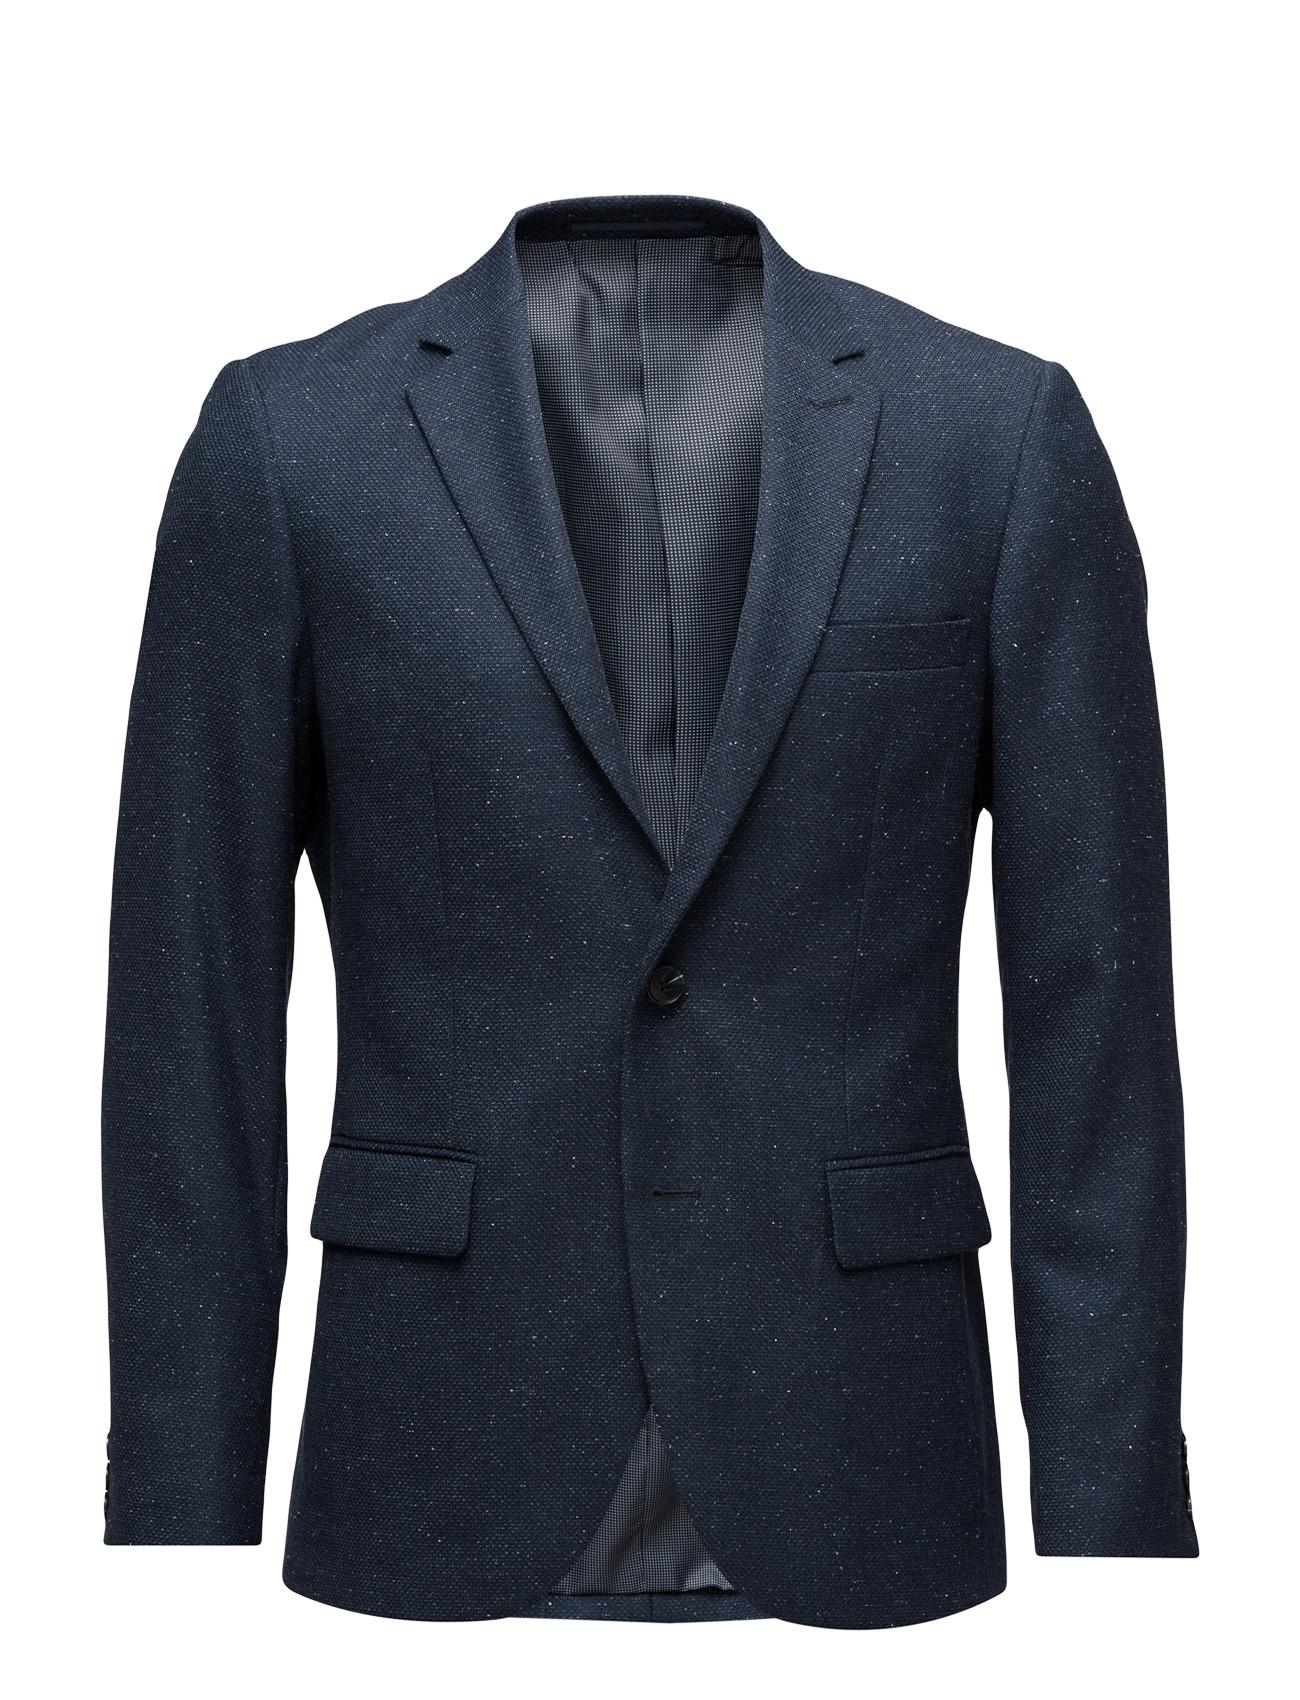 George Blue Blazer Matinique Blazere til Mænd i Navy Blazer